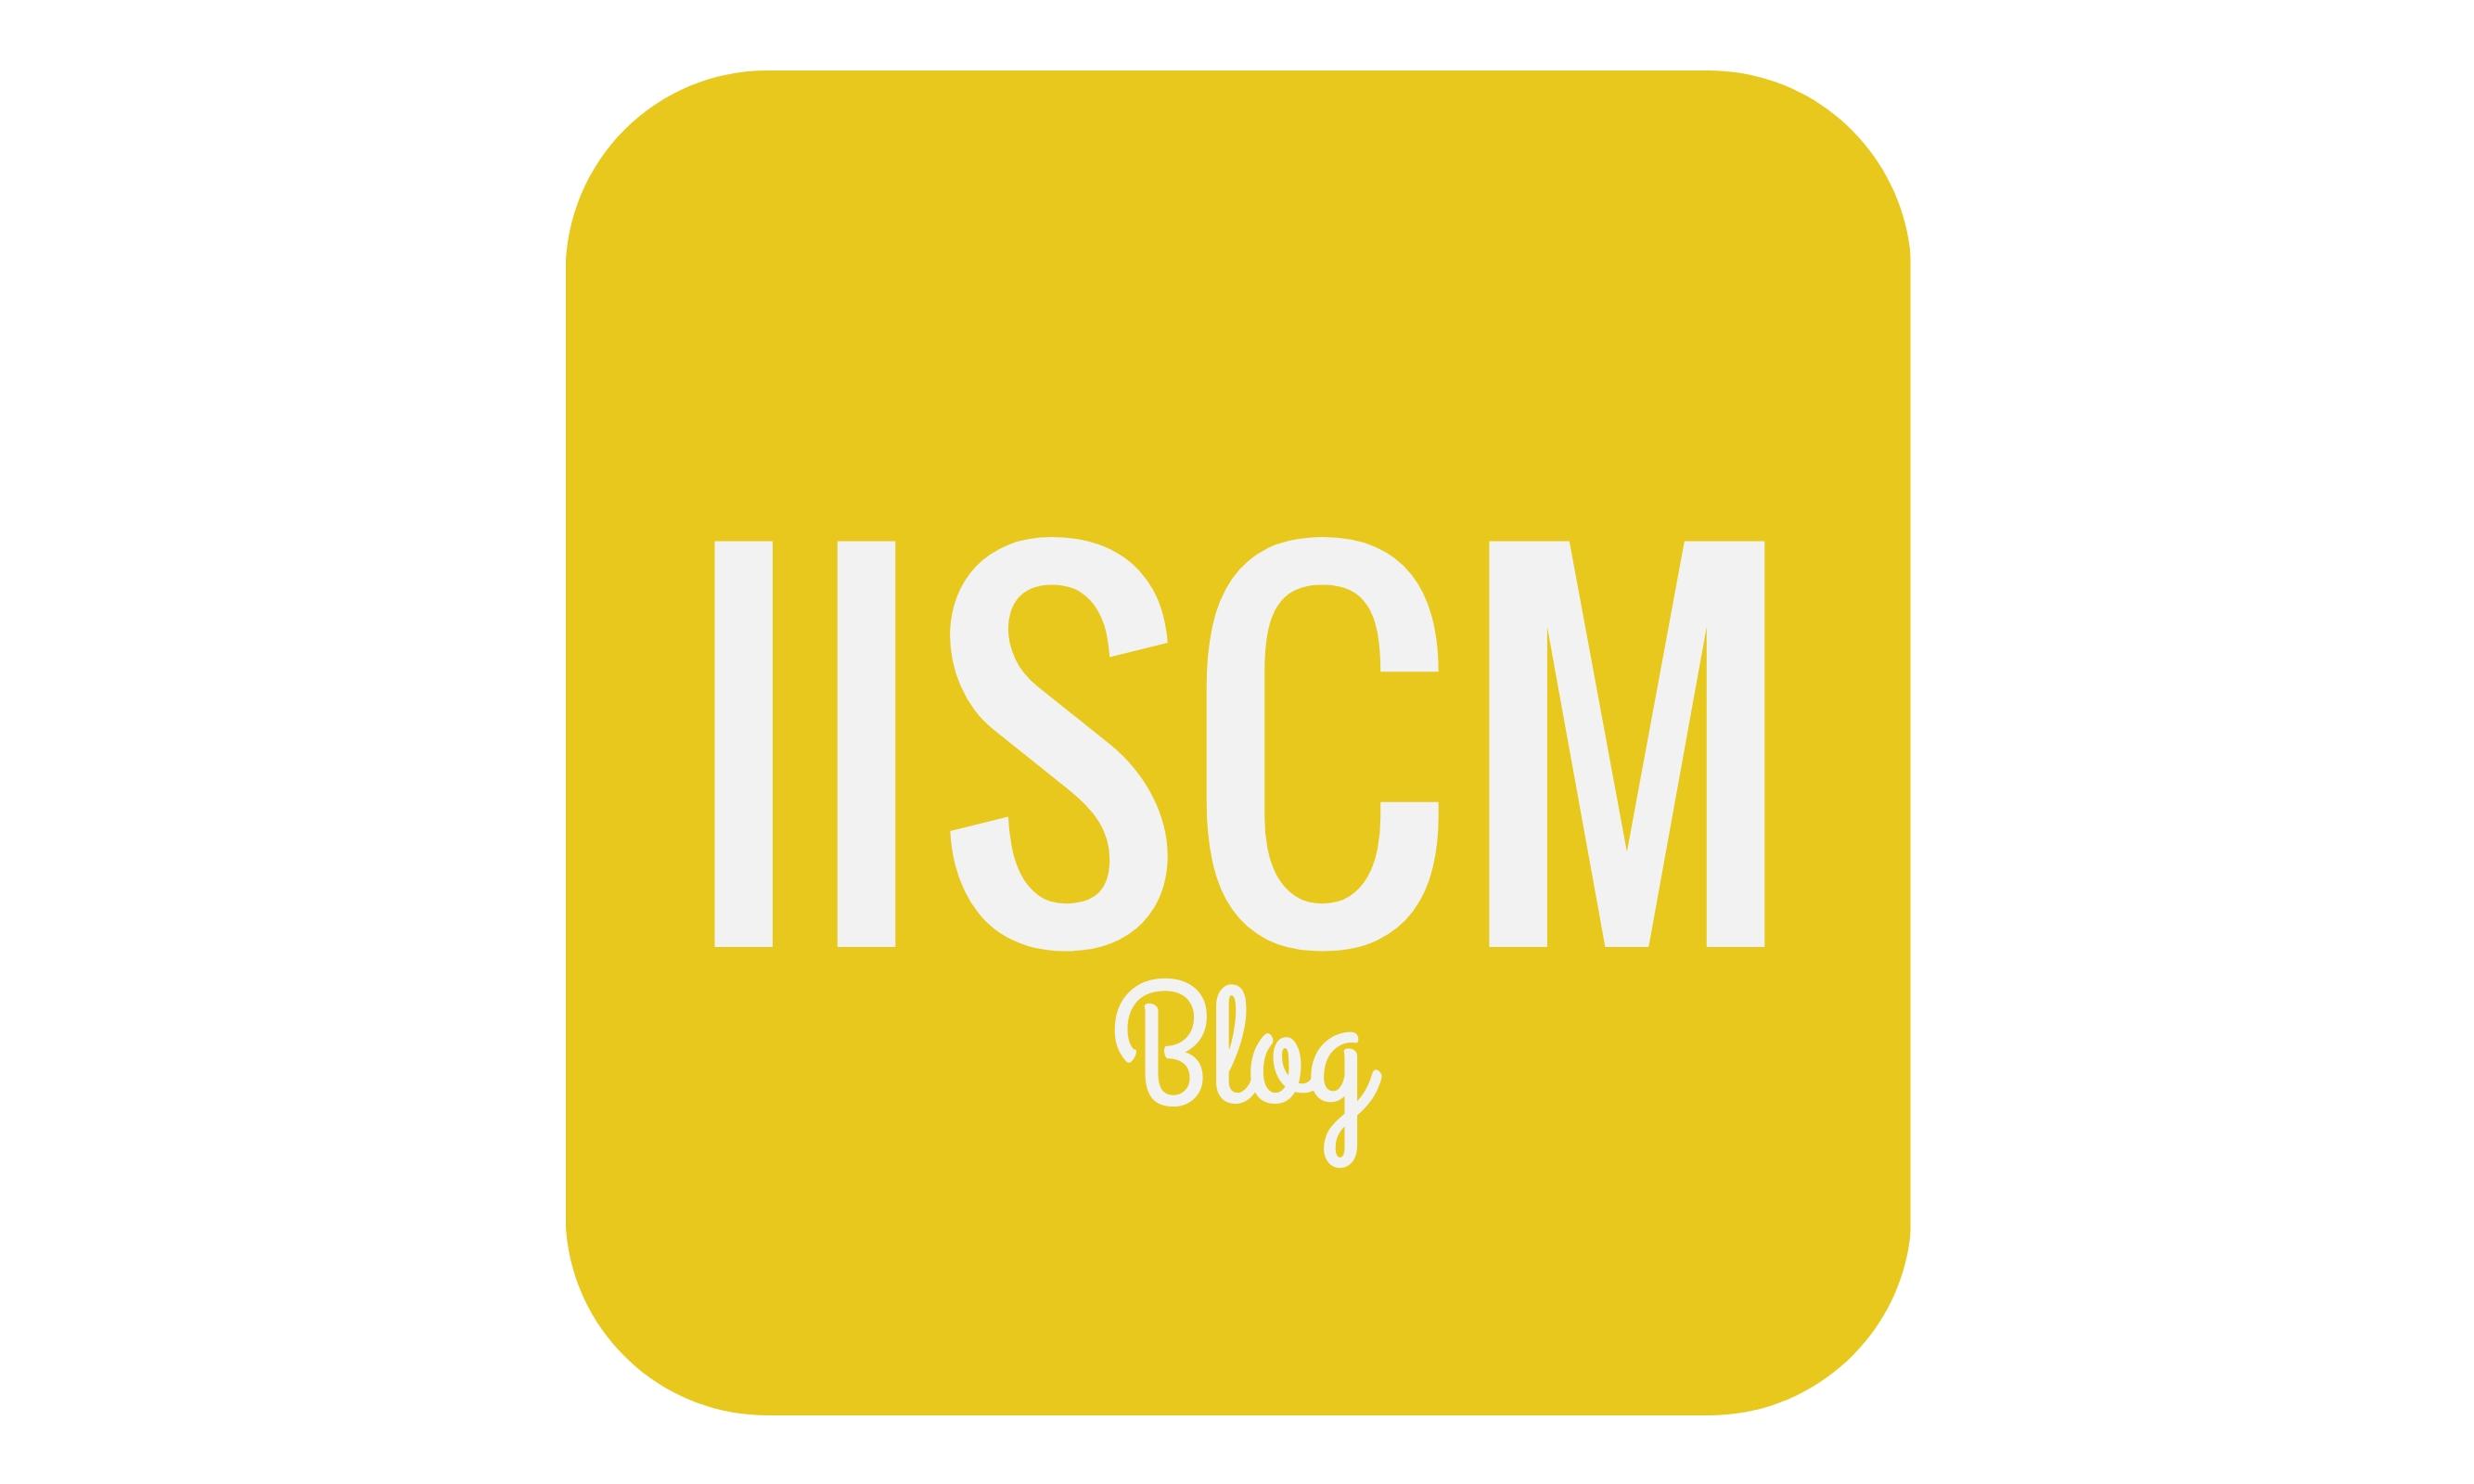 IISCM